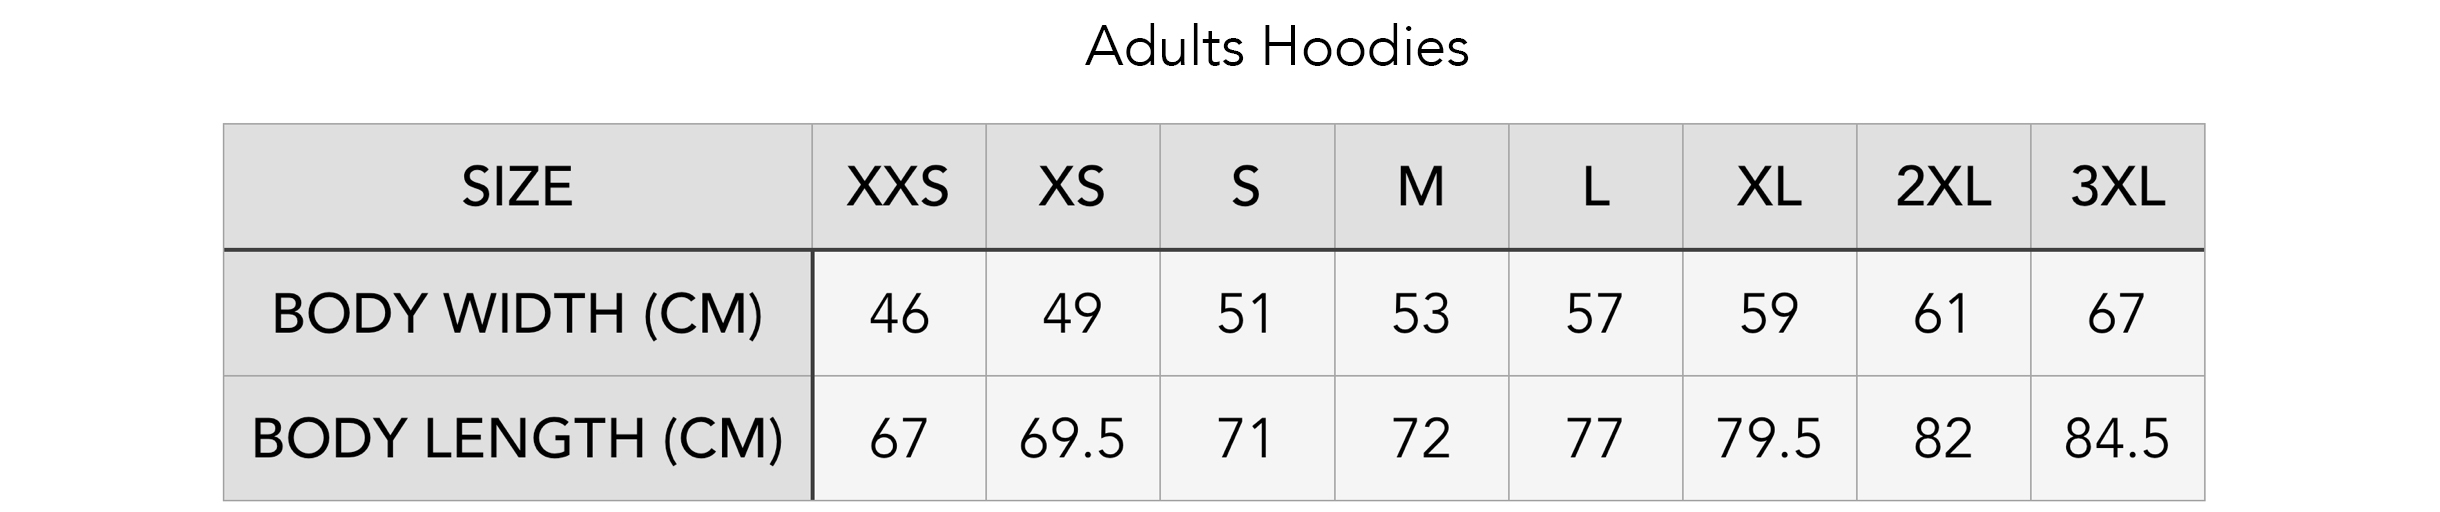 Stencil Hoodie (Adults) SS Guide.jpg